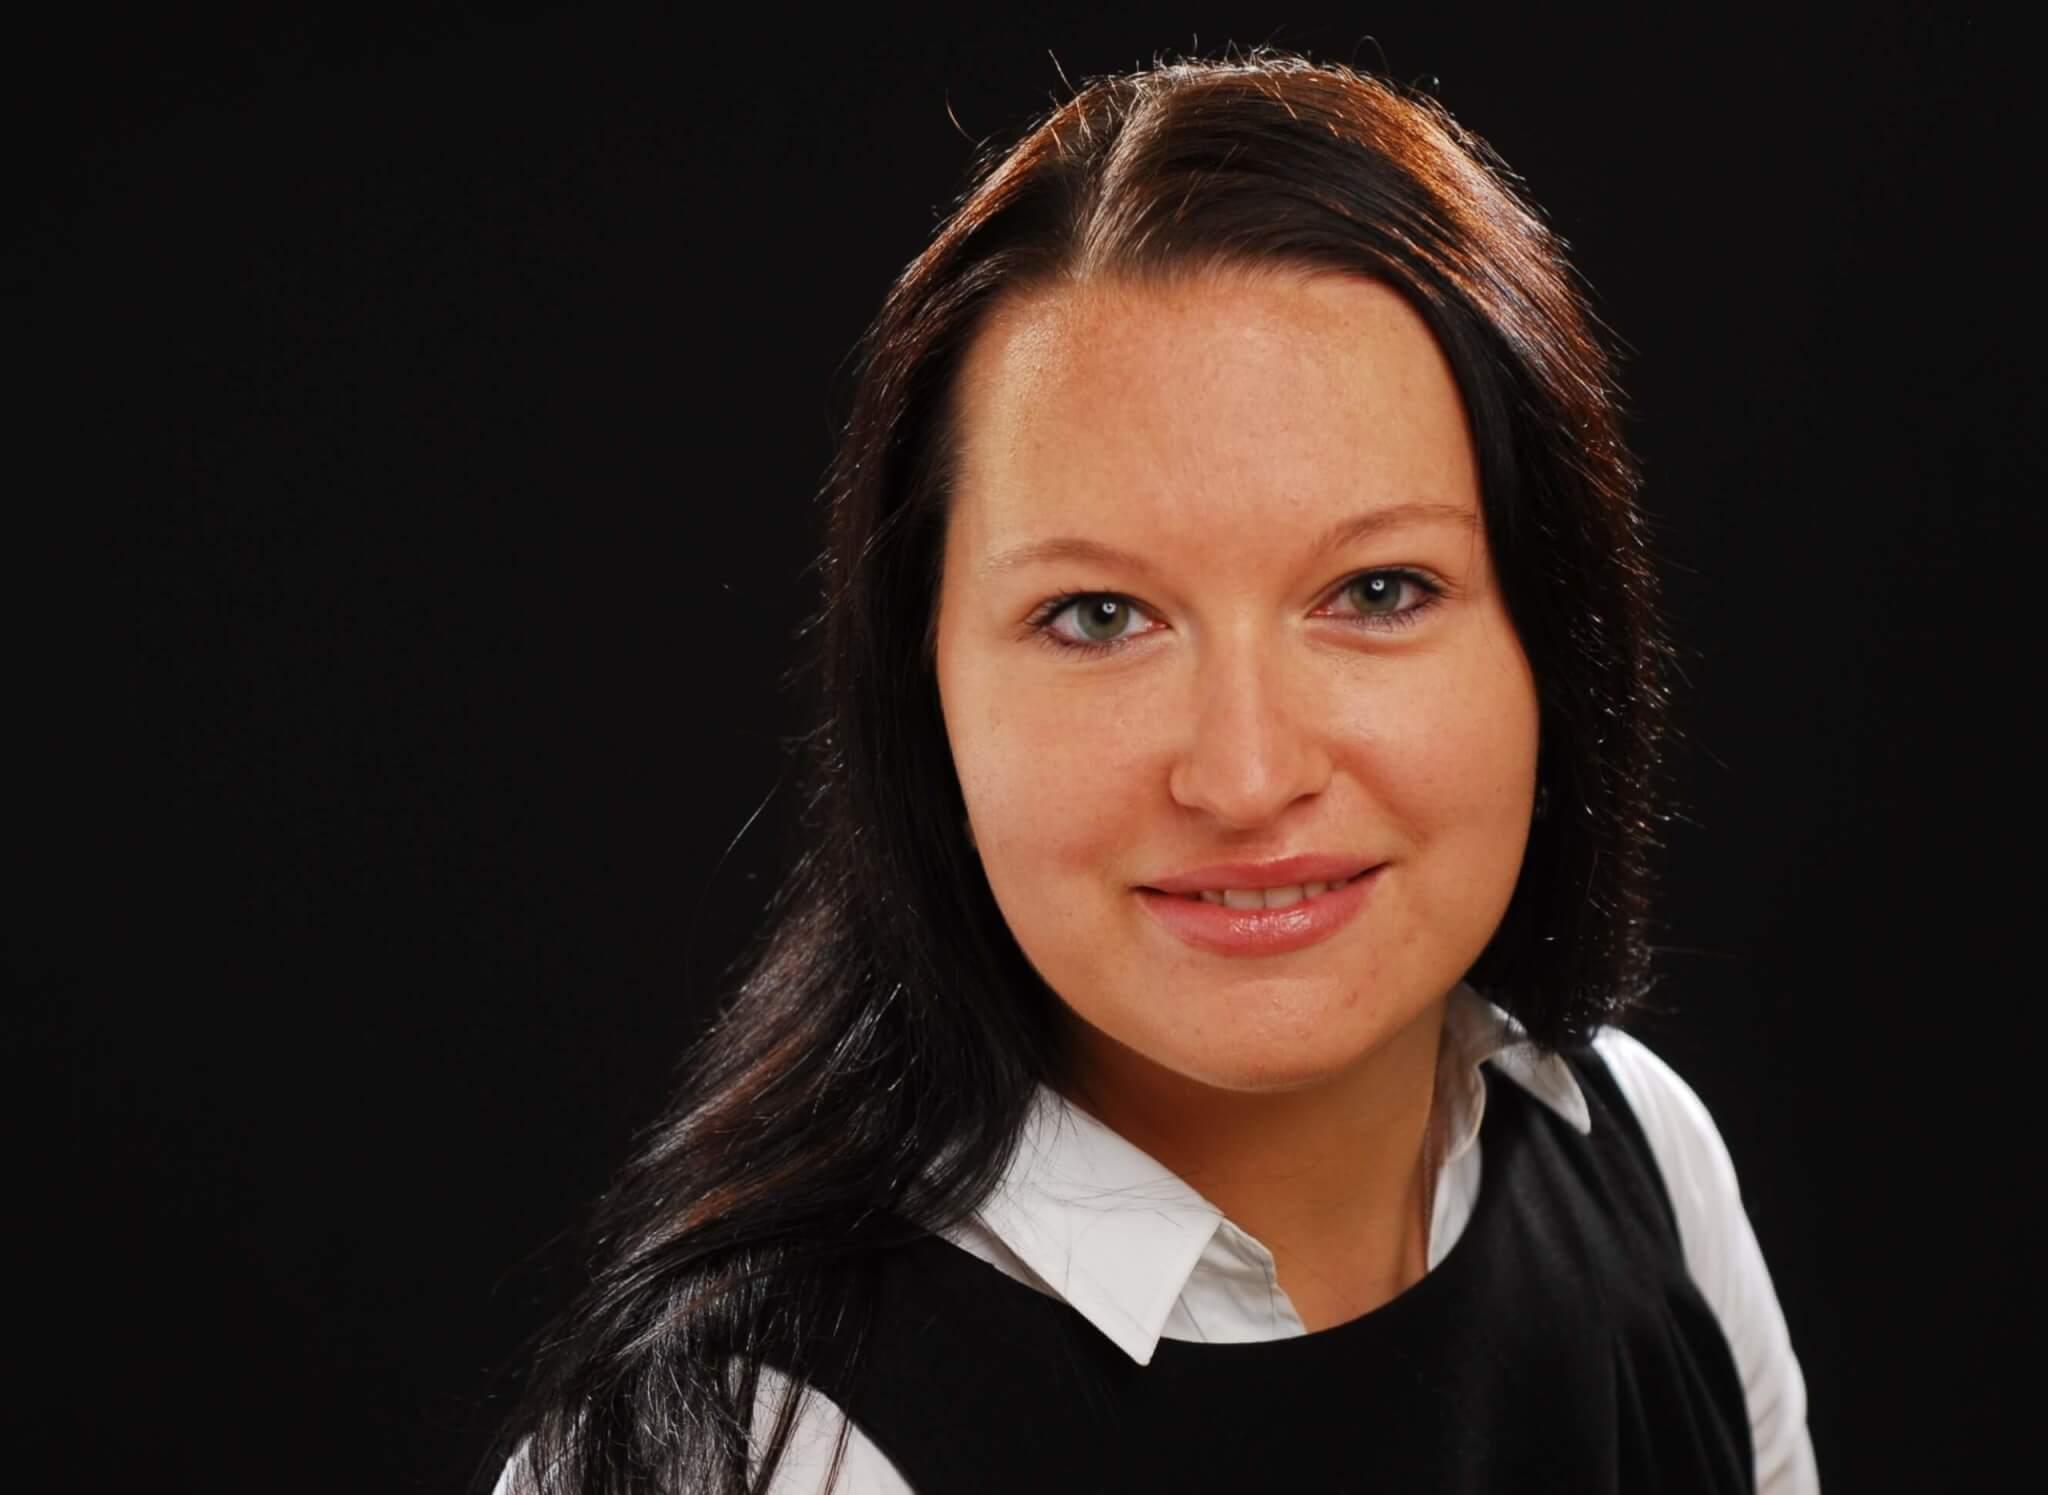 Yvonne Gasch